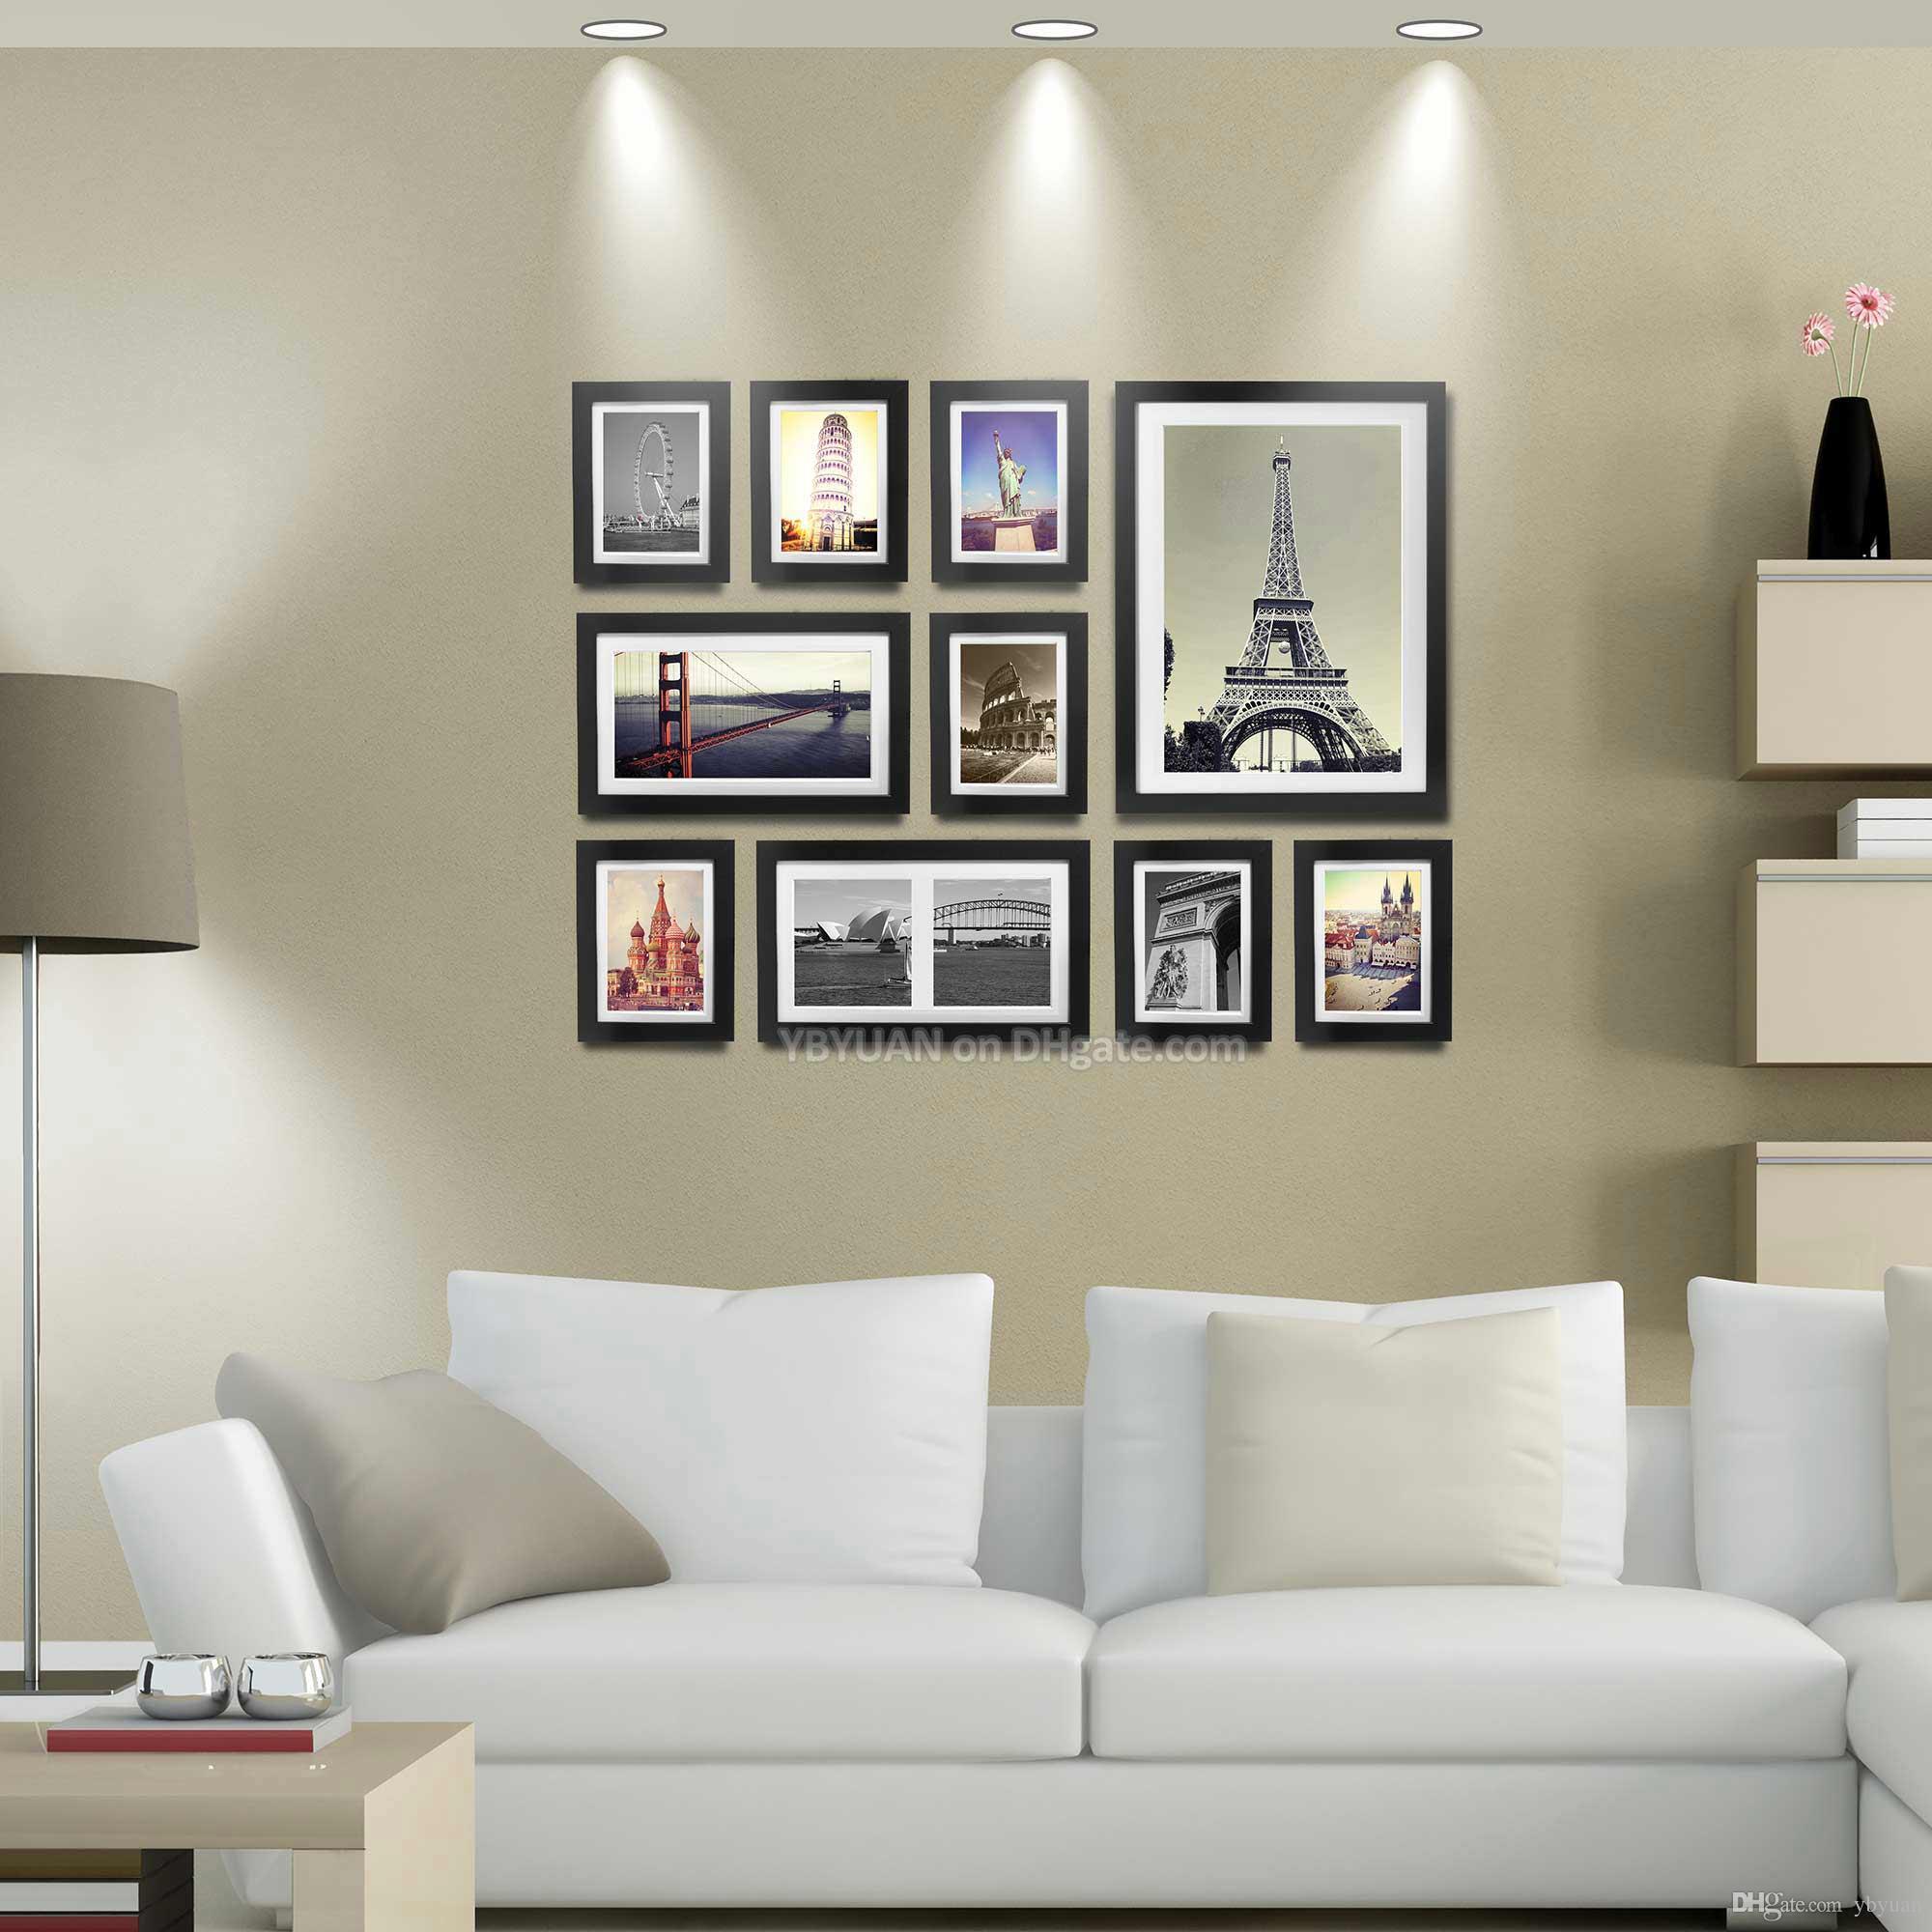 b394e0aa133 2018 Wood Photo Frame Gallery Wall Modern Style Flat Moulding Border